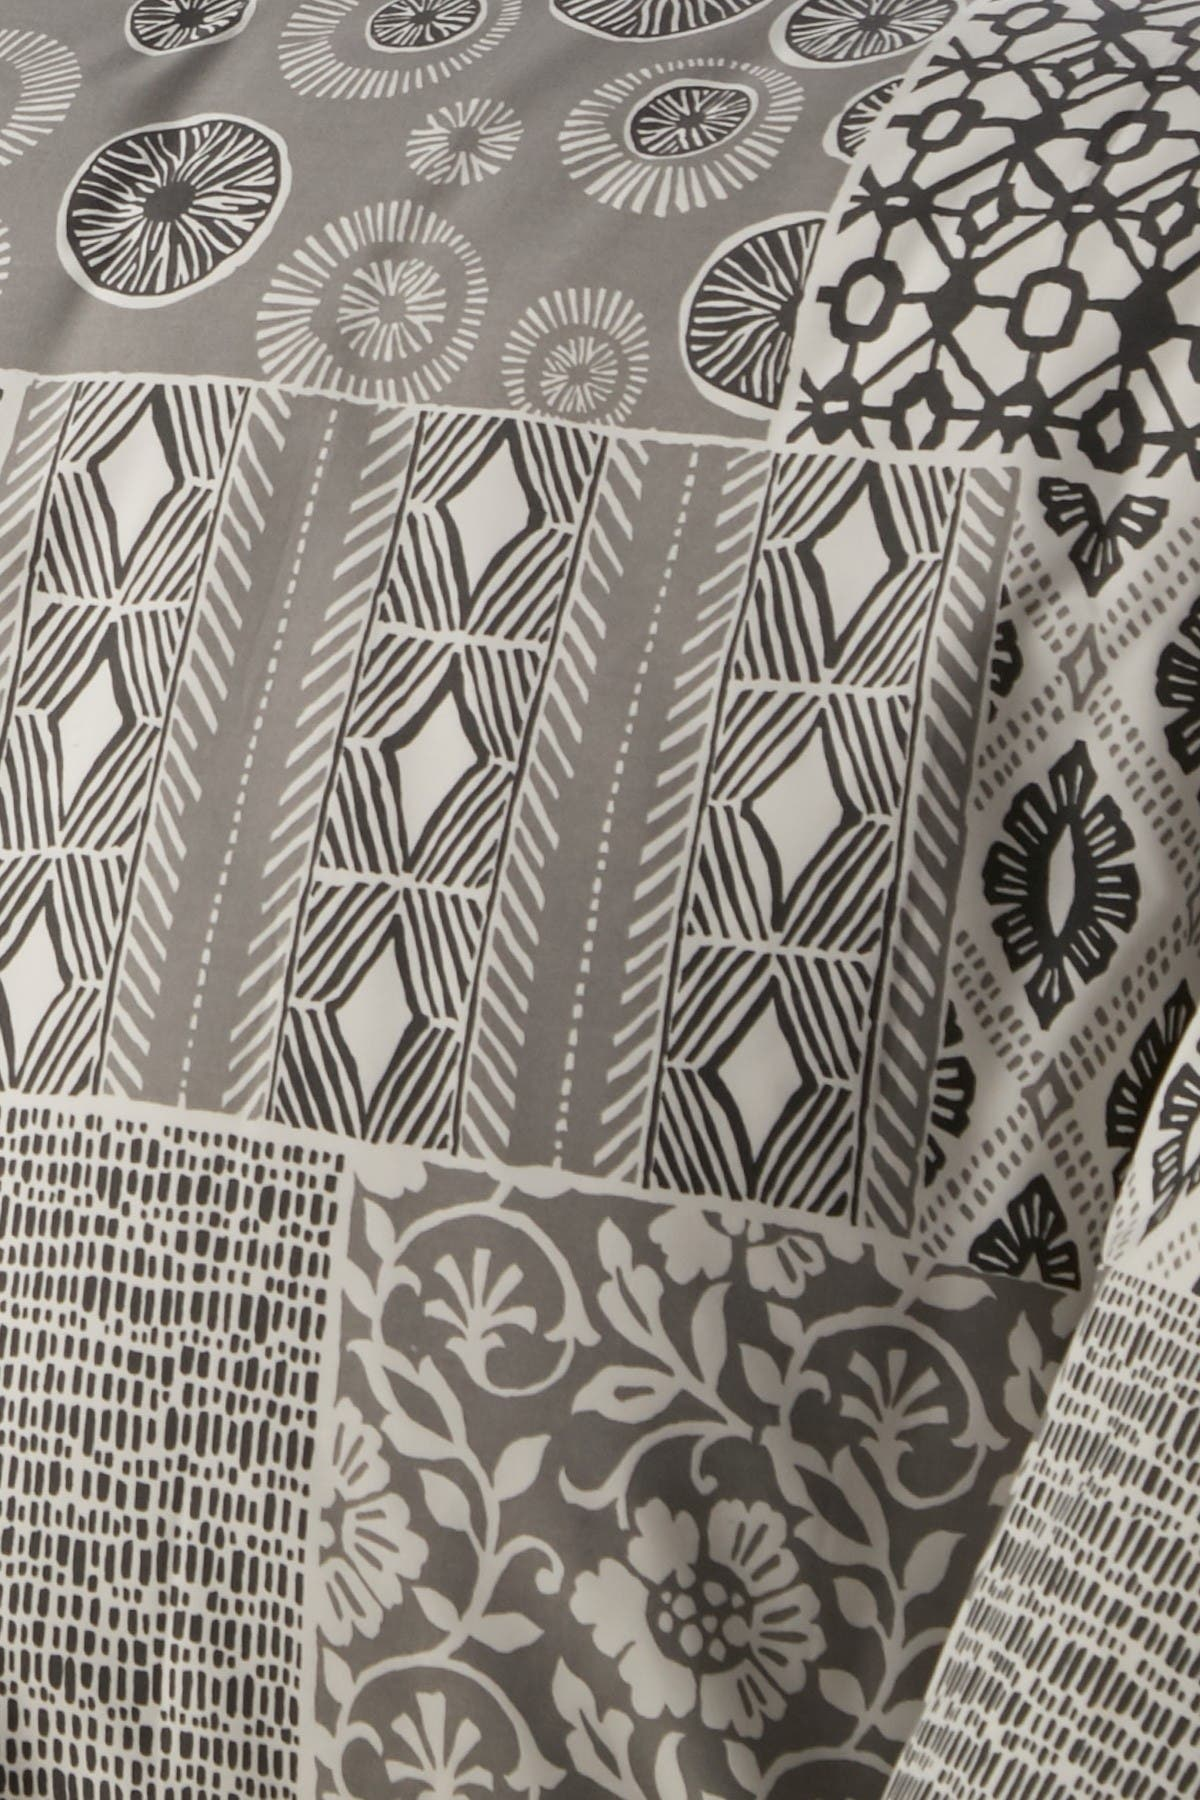 Image of SOUTHSHORE FINE LINENS King/California King Premium Oversized Duvet 3-Piece Set - Global Patchwork Gray